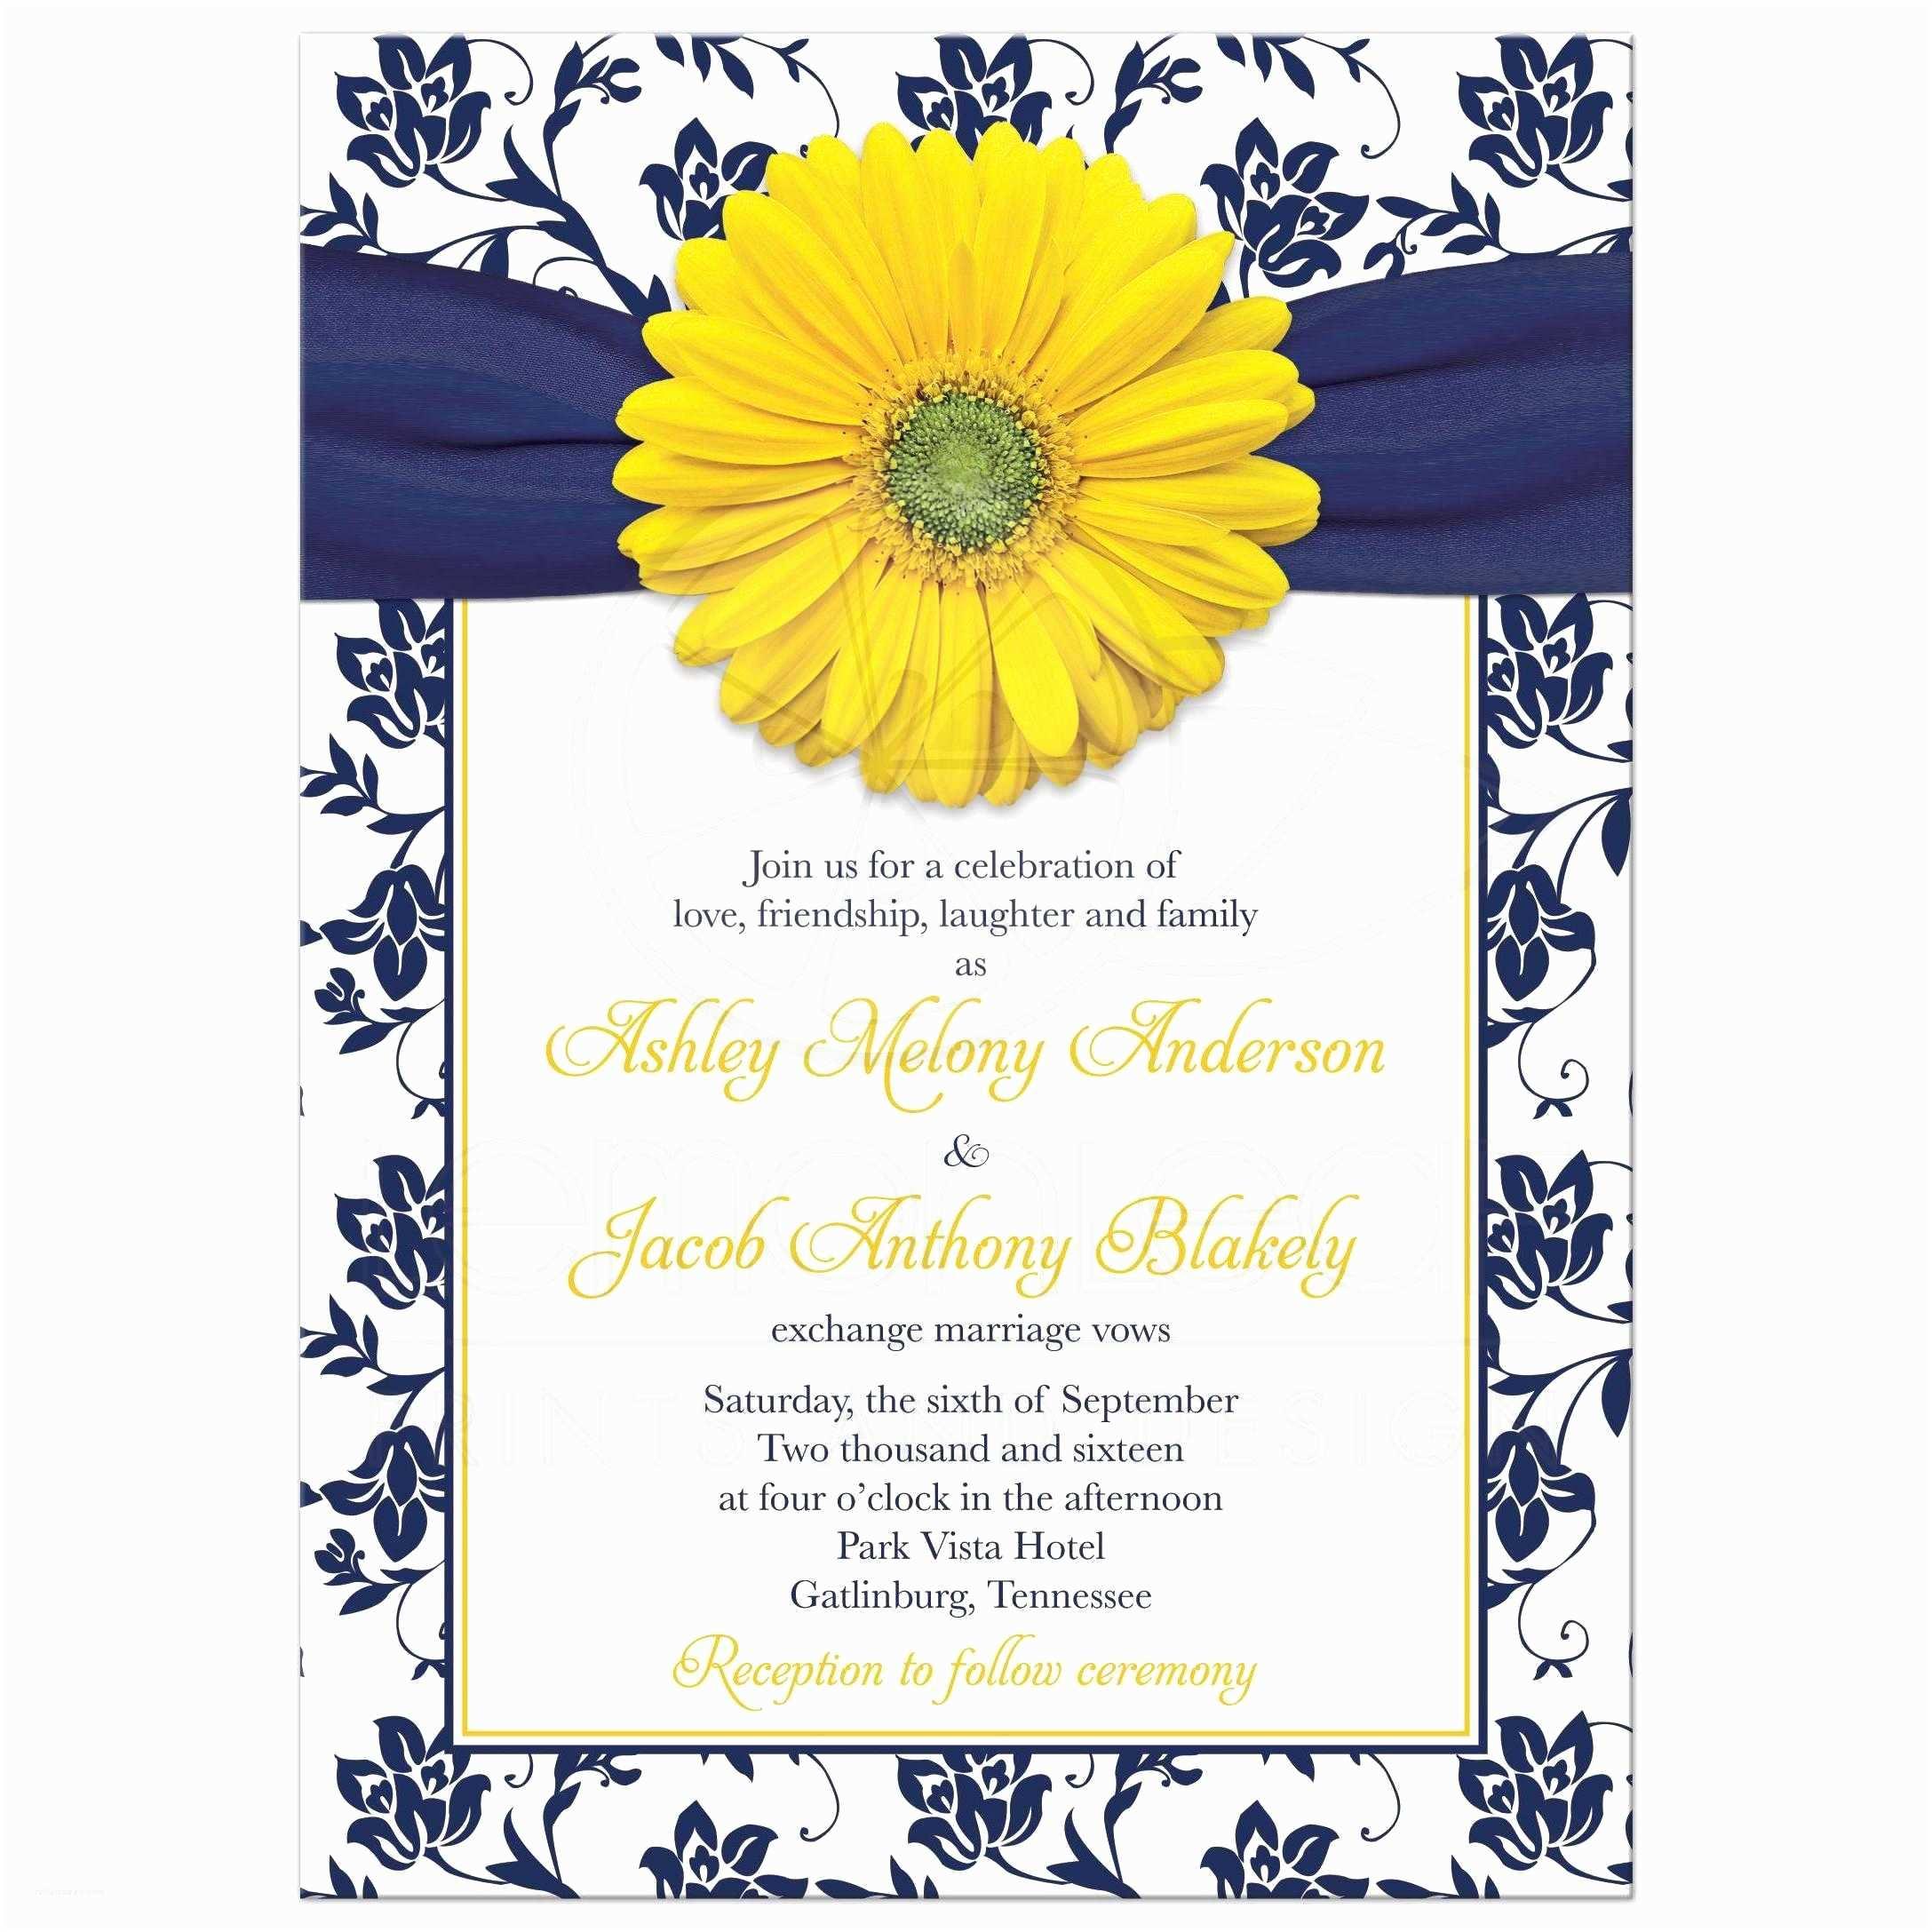 Navy Blue and White Wedding Invitations Yellow Daisy Navy Floral Wedding Invitation